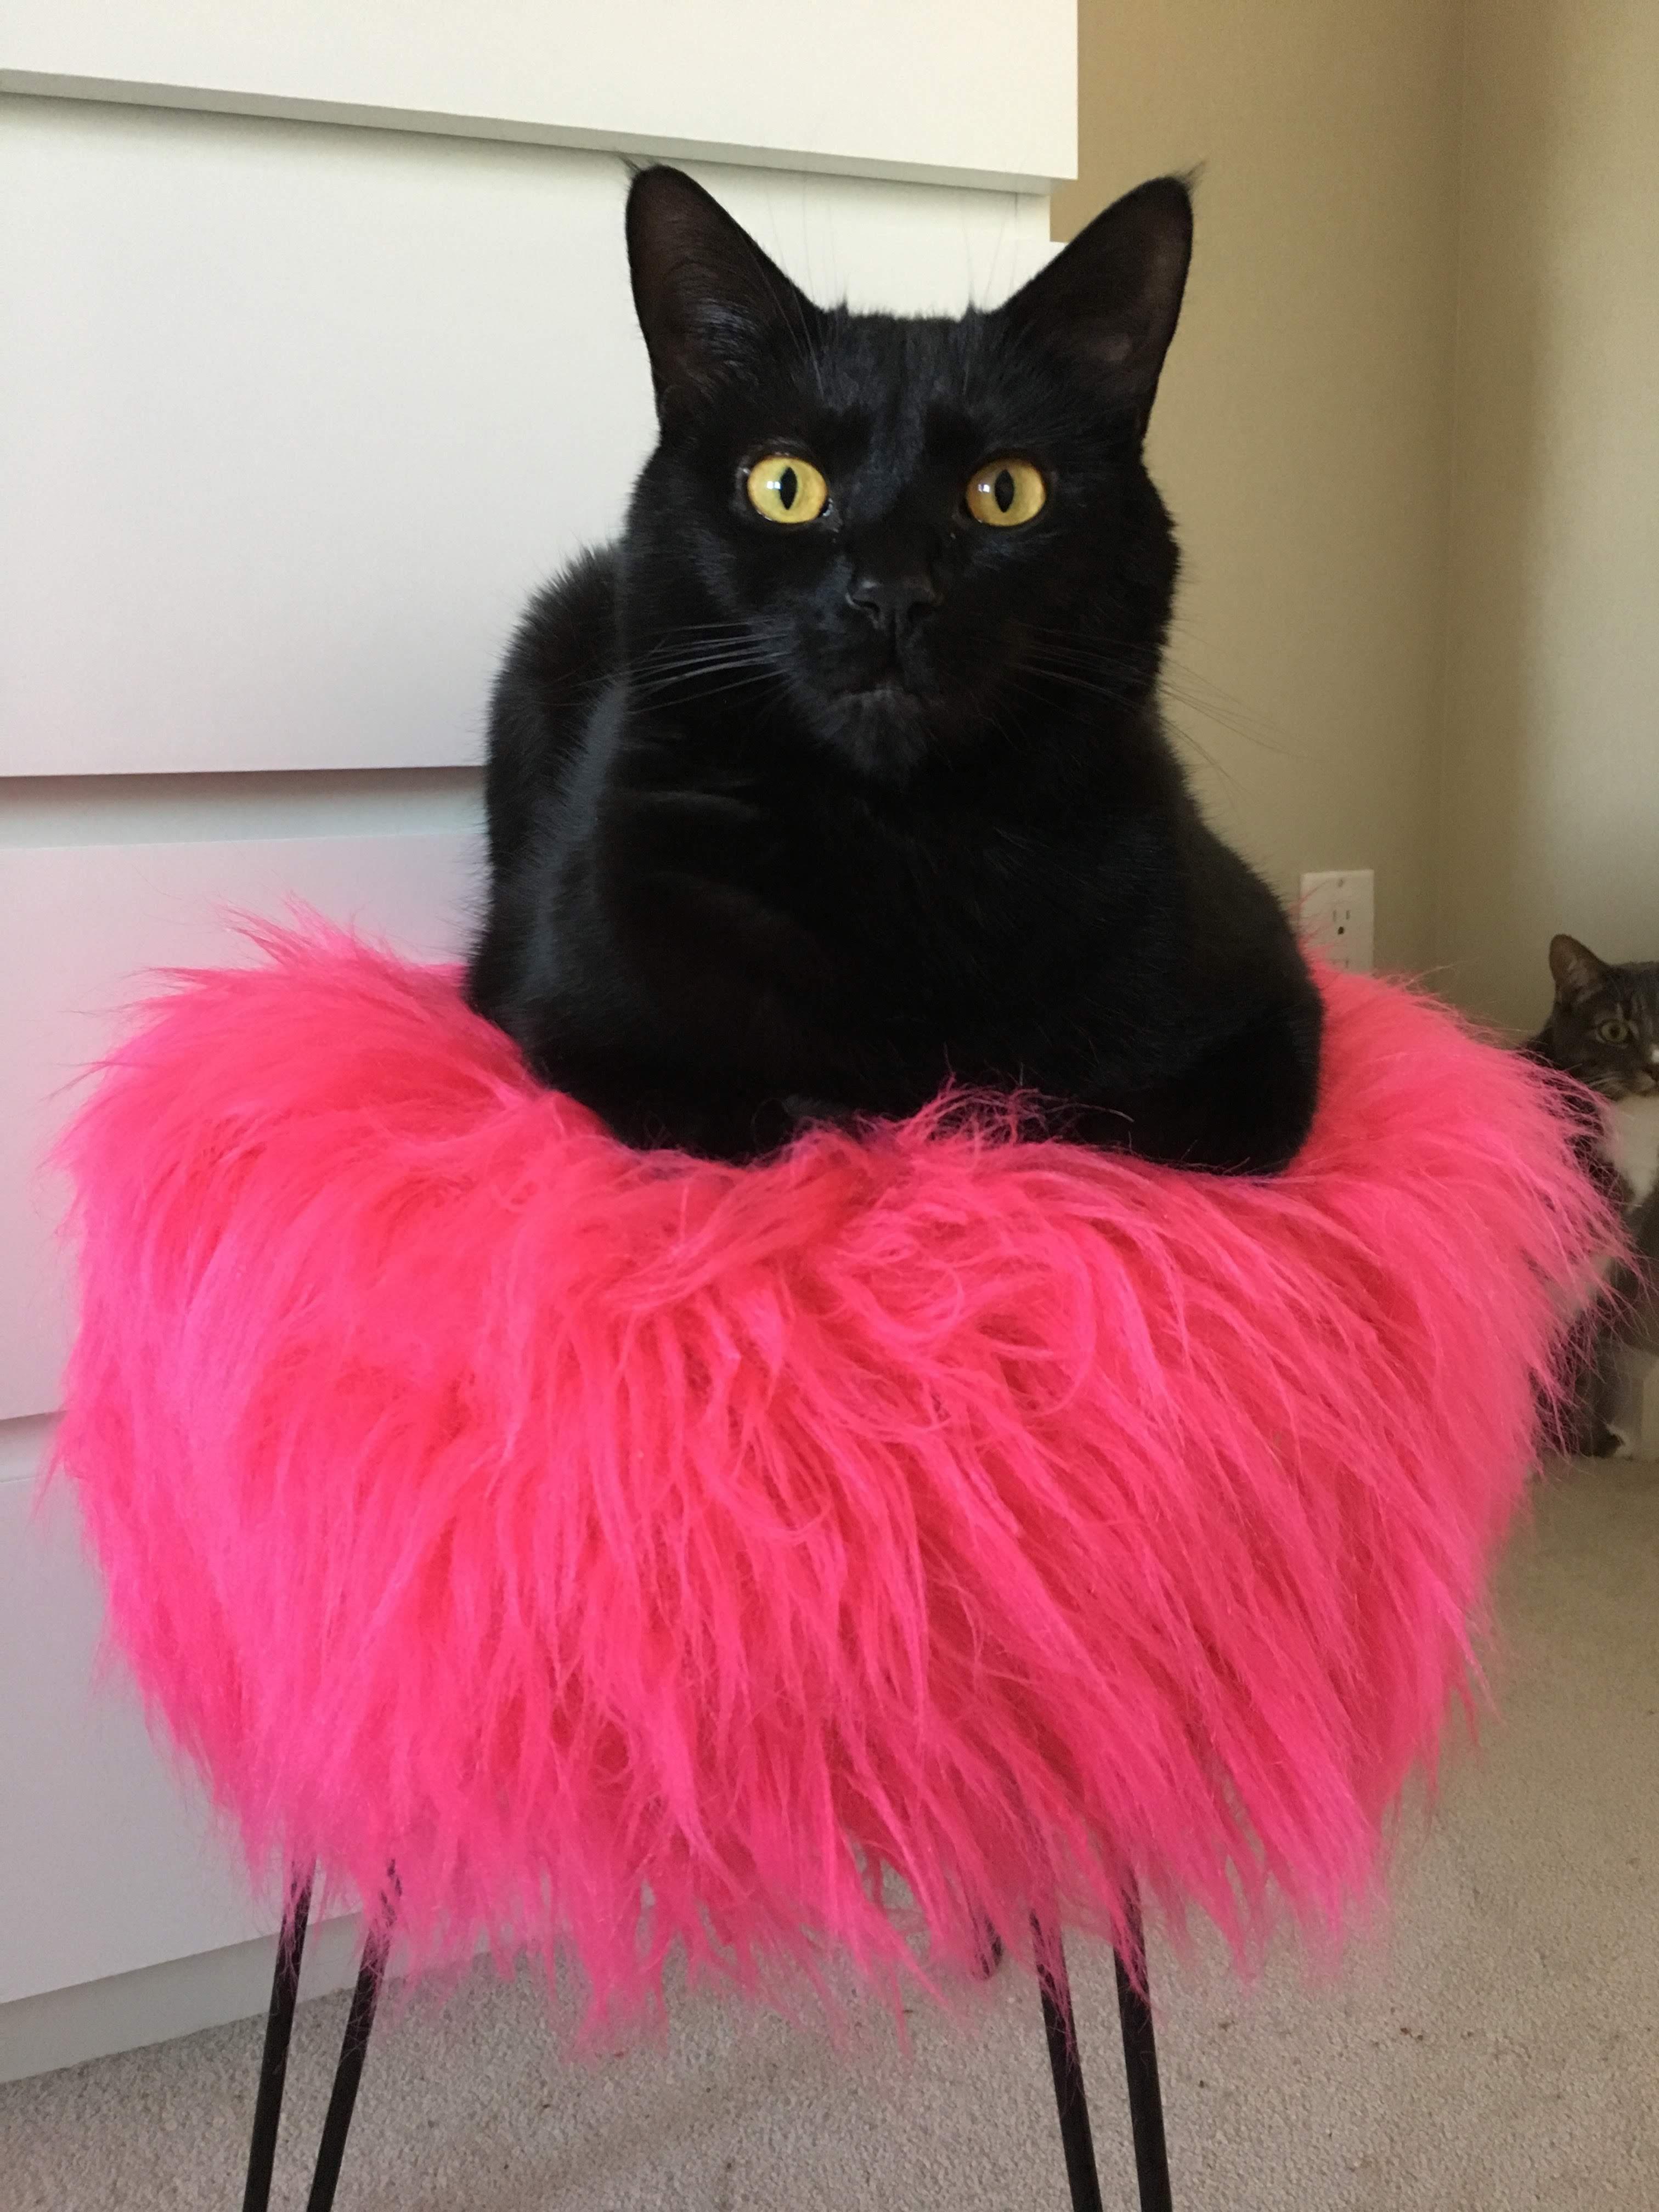 She Is Tutu Much In 2020 Black Cat Crazy Cats Cat Clothes